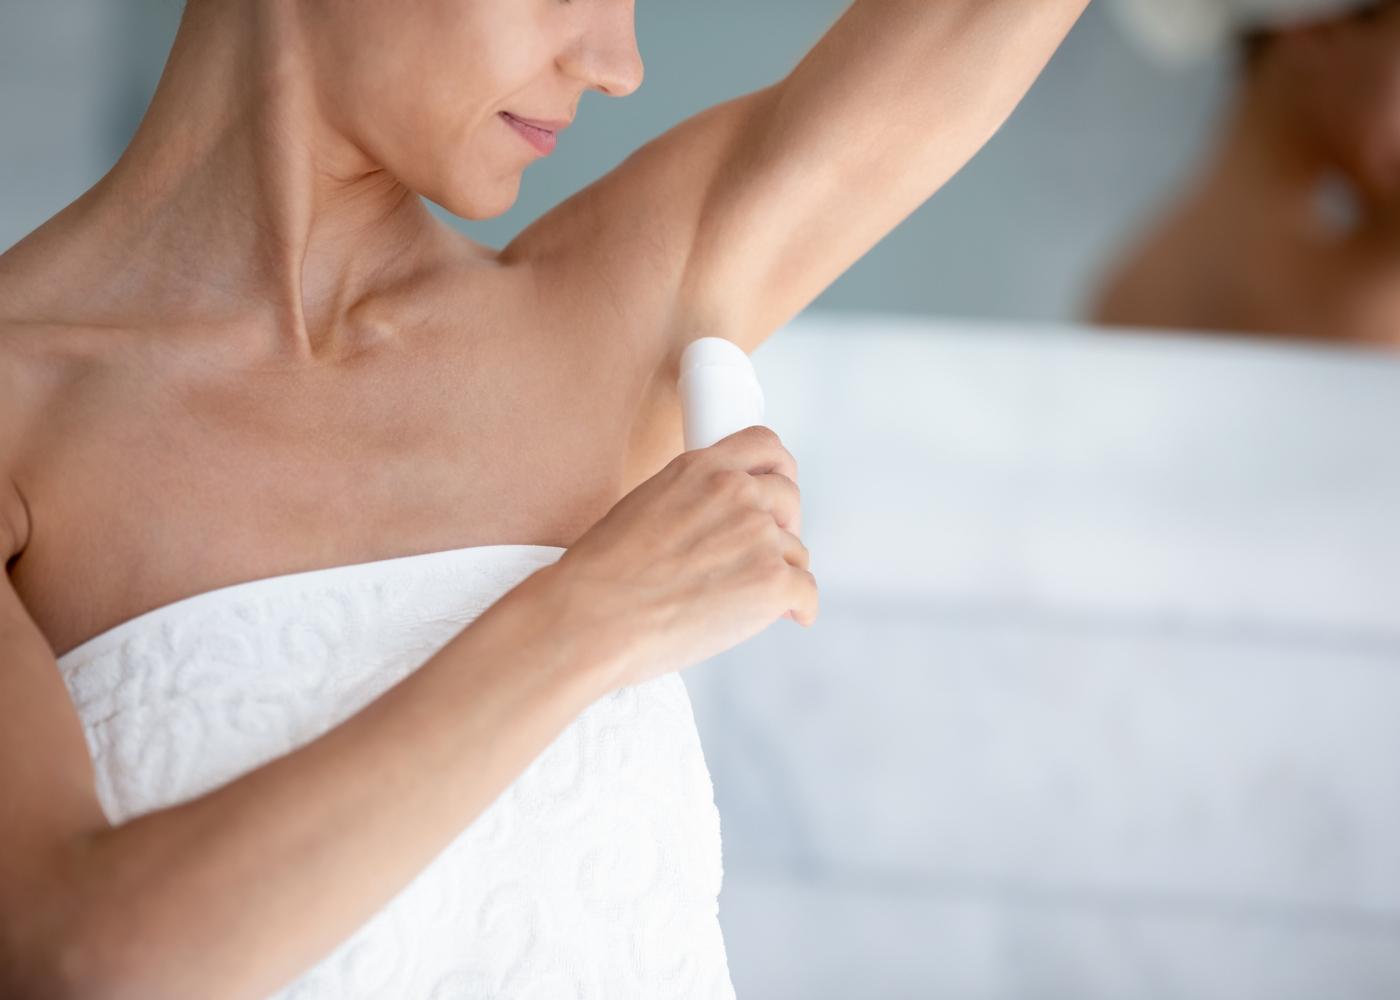 mulher a colocar desodorizante